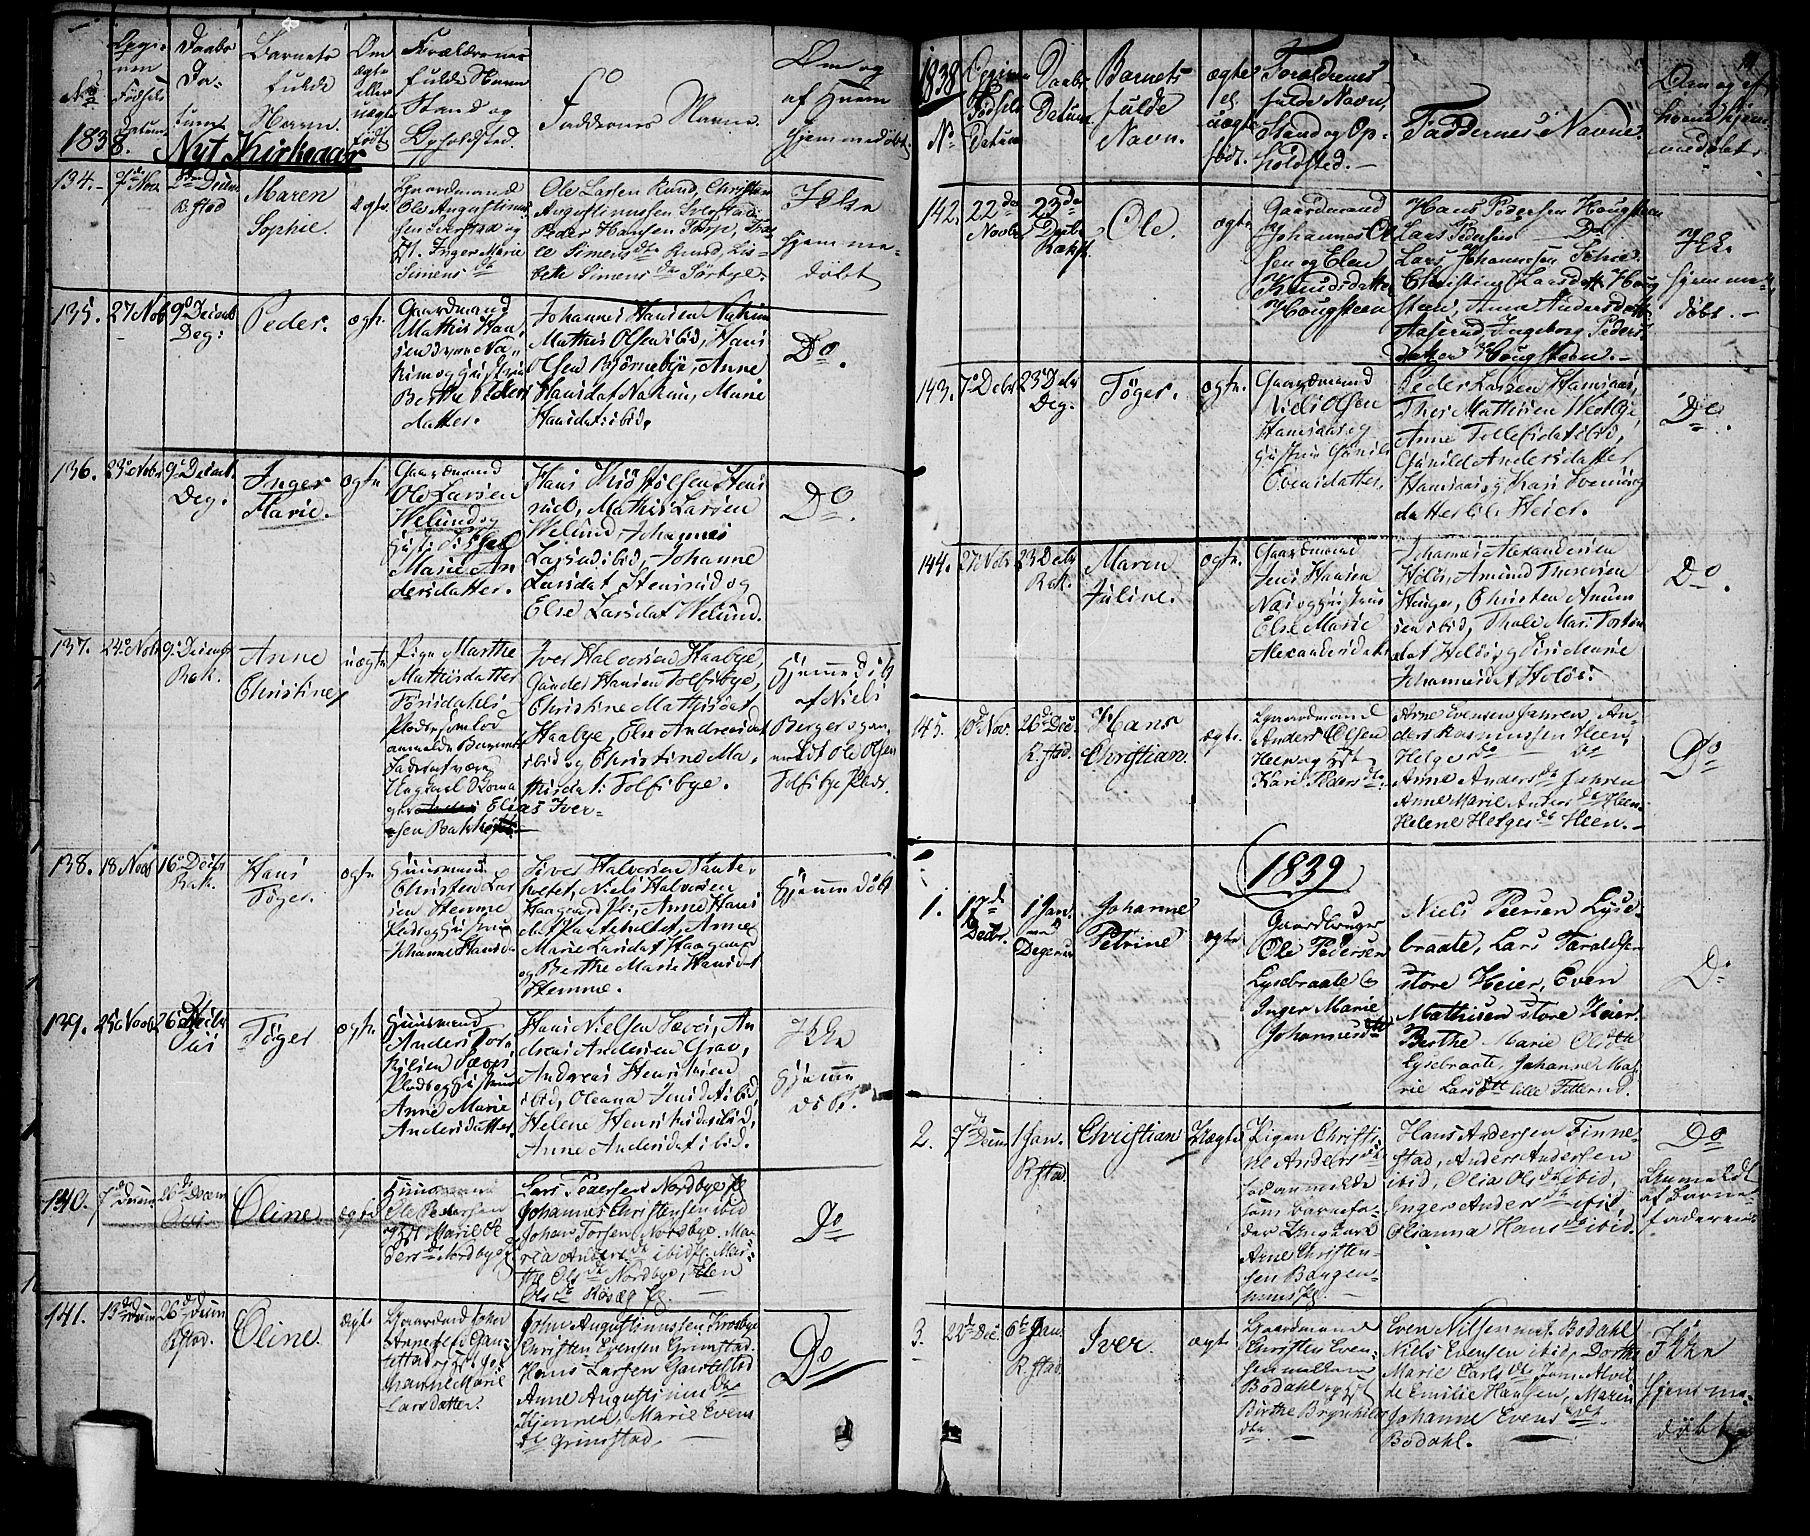 SAO, Rakkestad prestekontor Kirkebøker, F/Fa/L0007: Ministerialbok nr. I 7, 1825-1841, s. 111